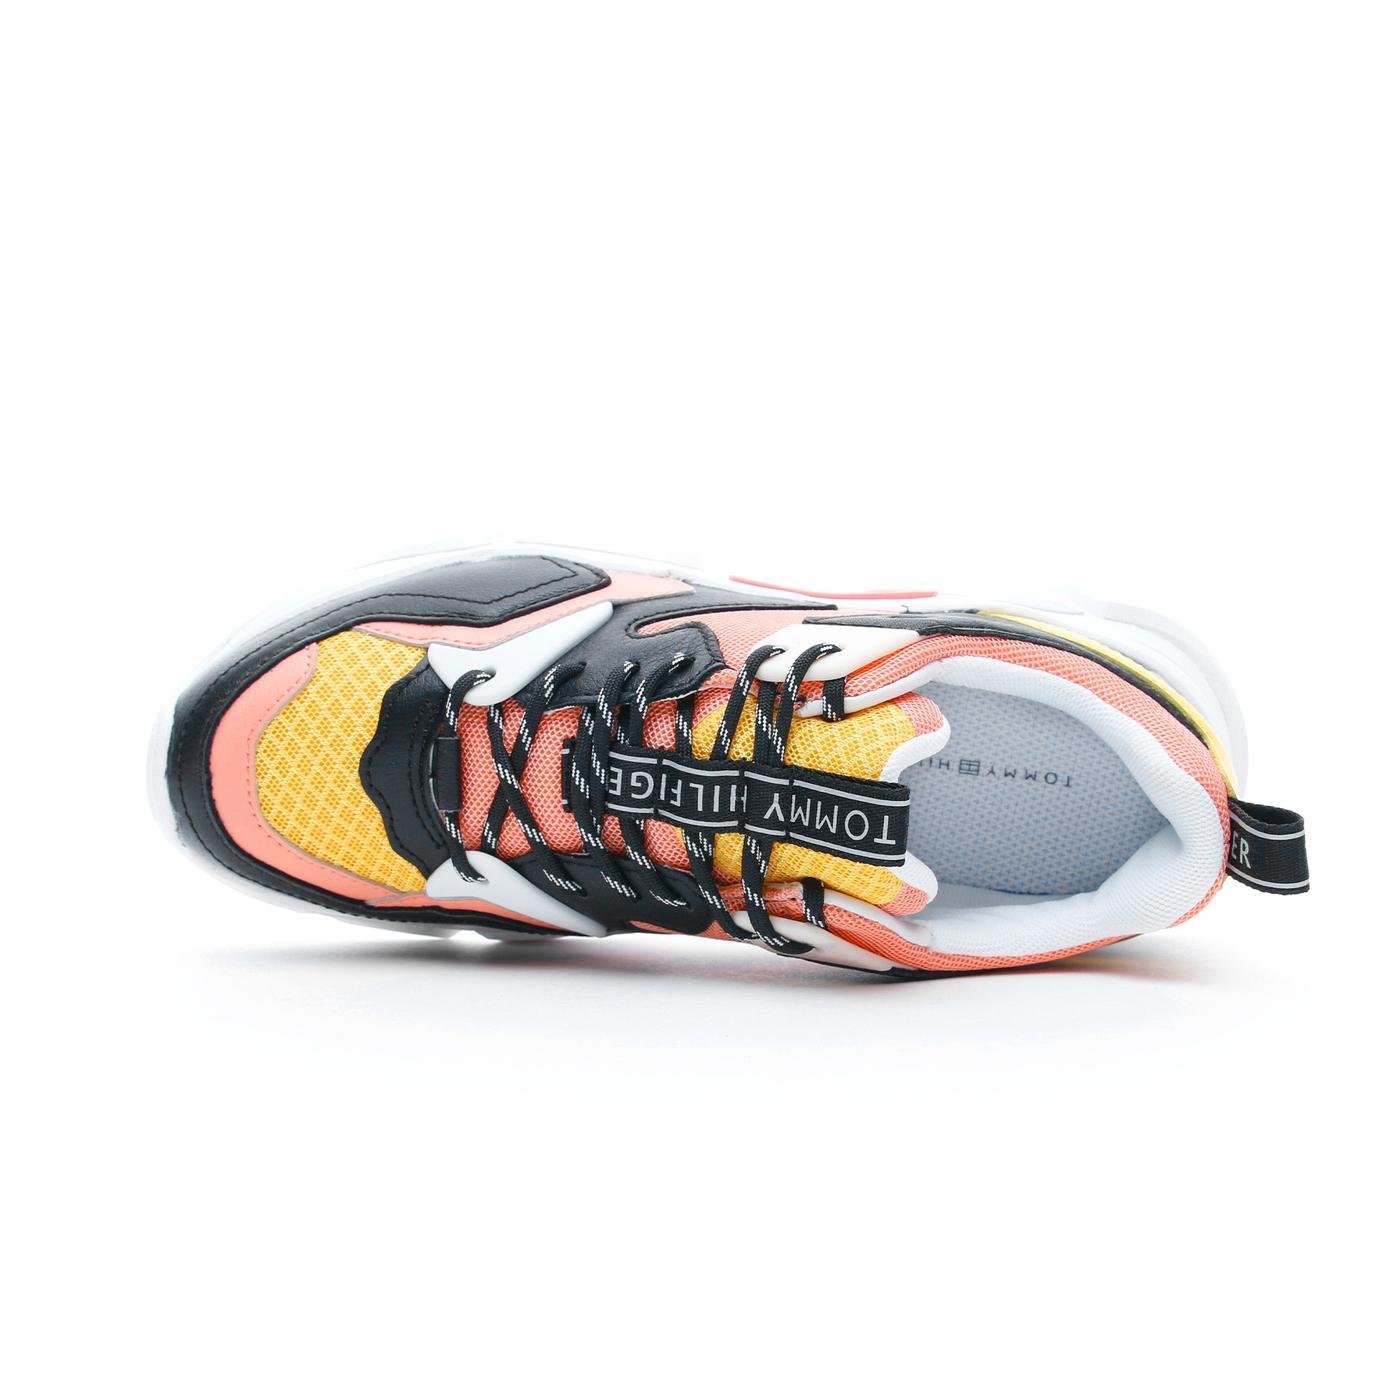 Tommy Hilfiger Chunky Lifestyle Kadın Pembe Spor Ayakkabı